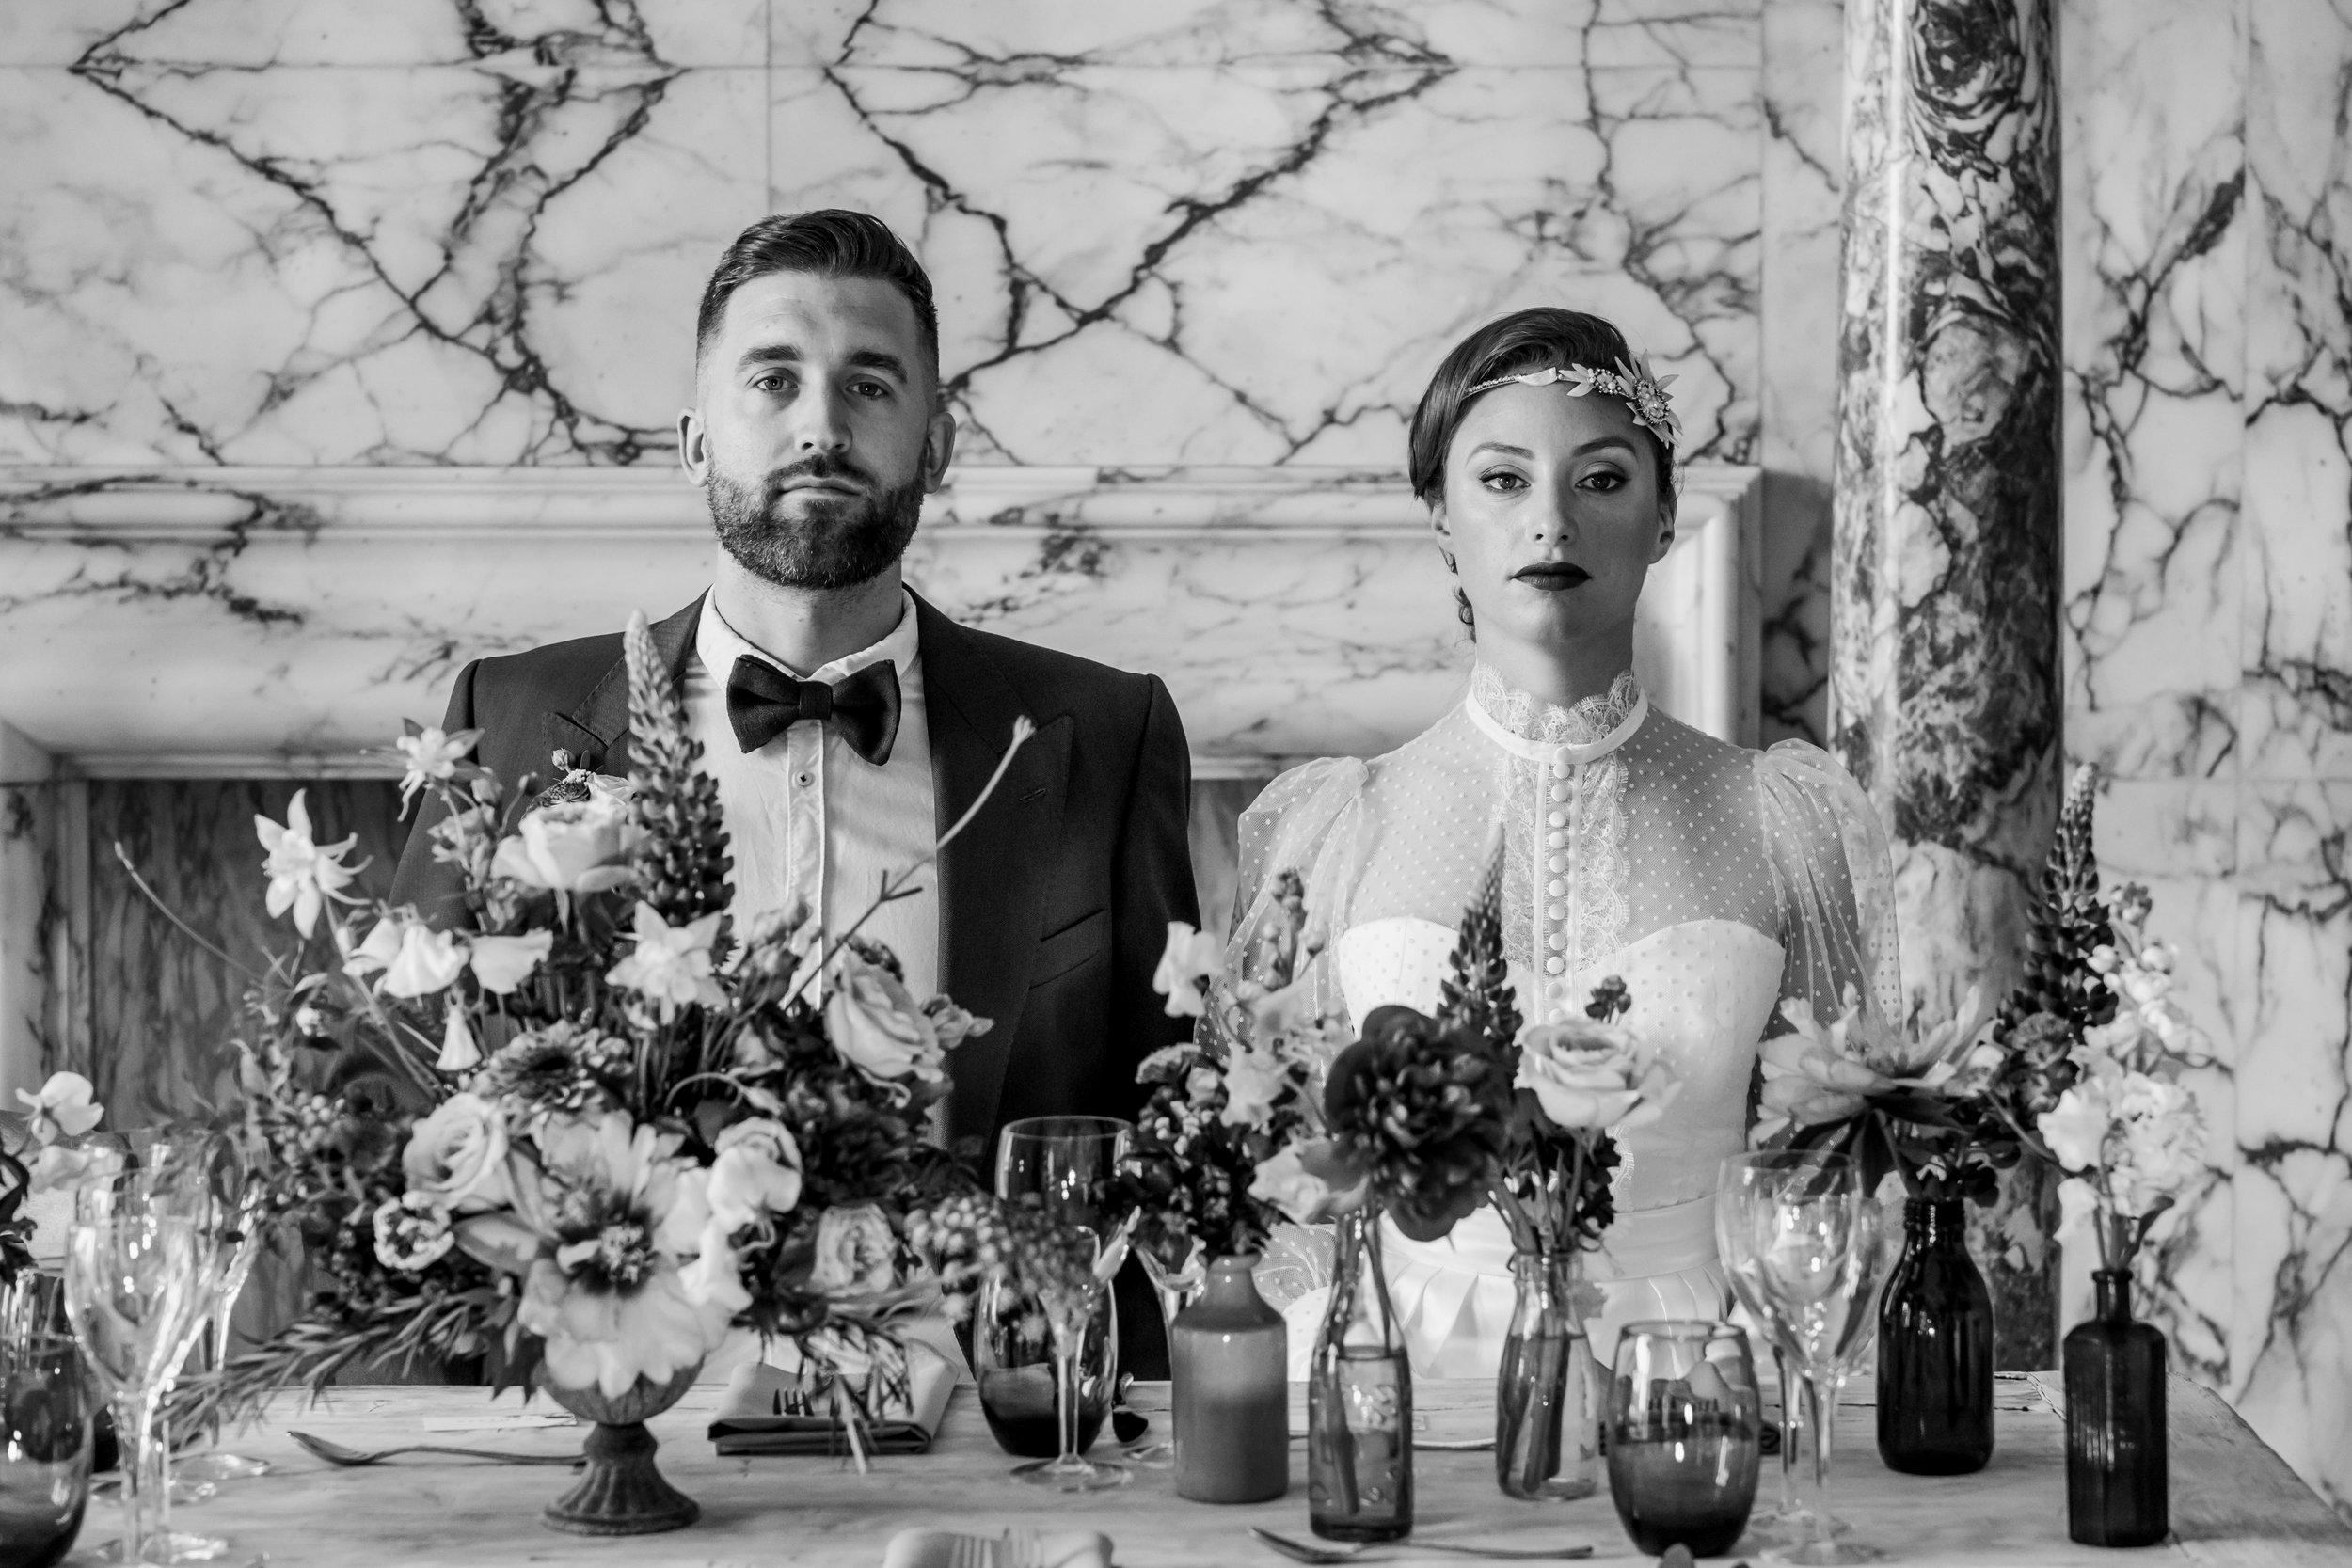 Jessica-Milberg-Photography-Margots-Wedding-Magazine-Balcombe-Place-StyledShoot-Creative-Alternative-Brighton-London-Photographer-41.jpg